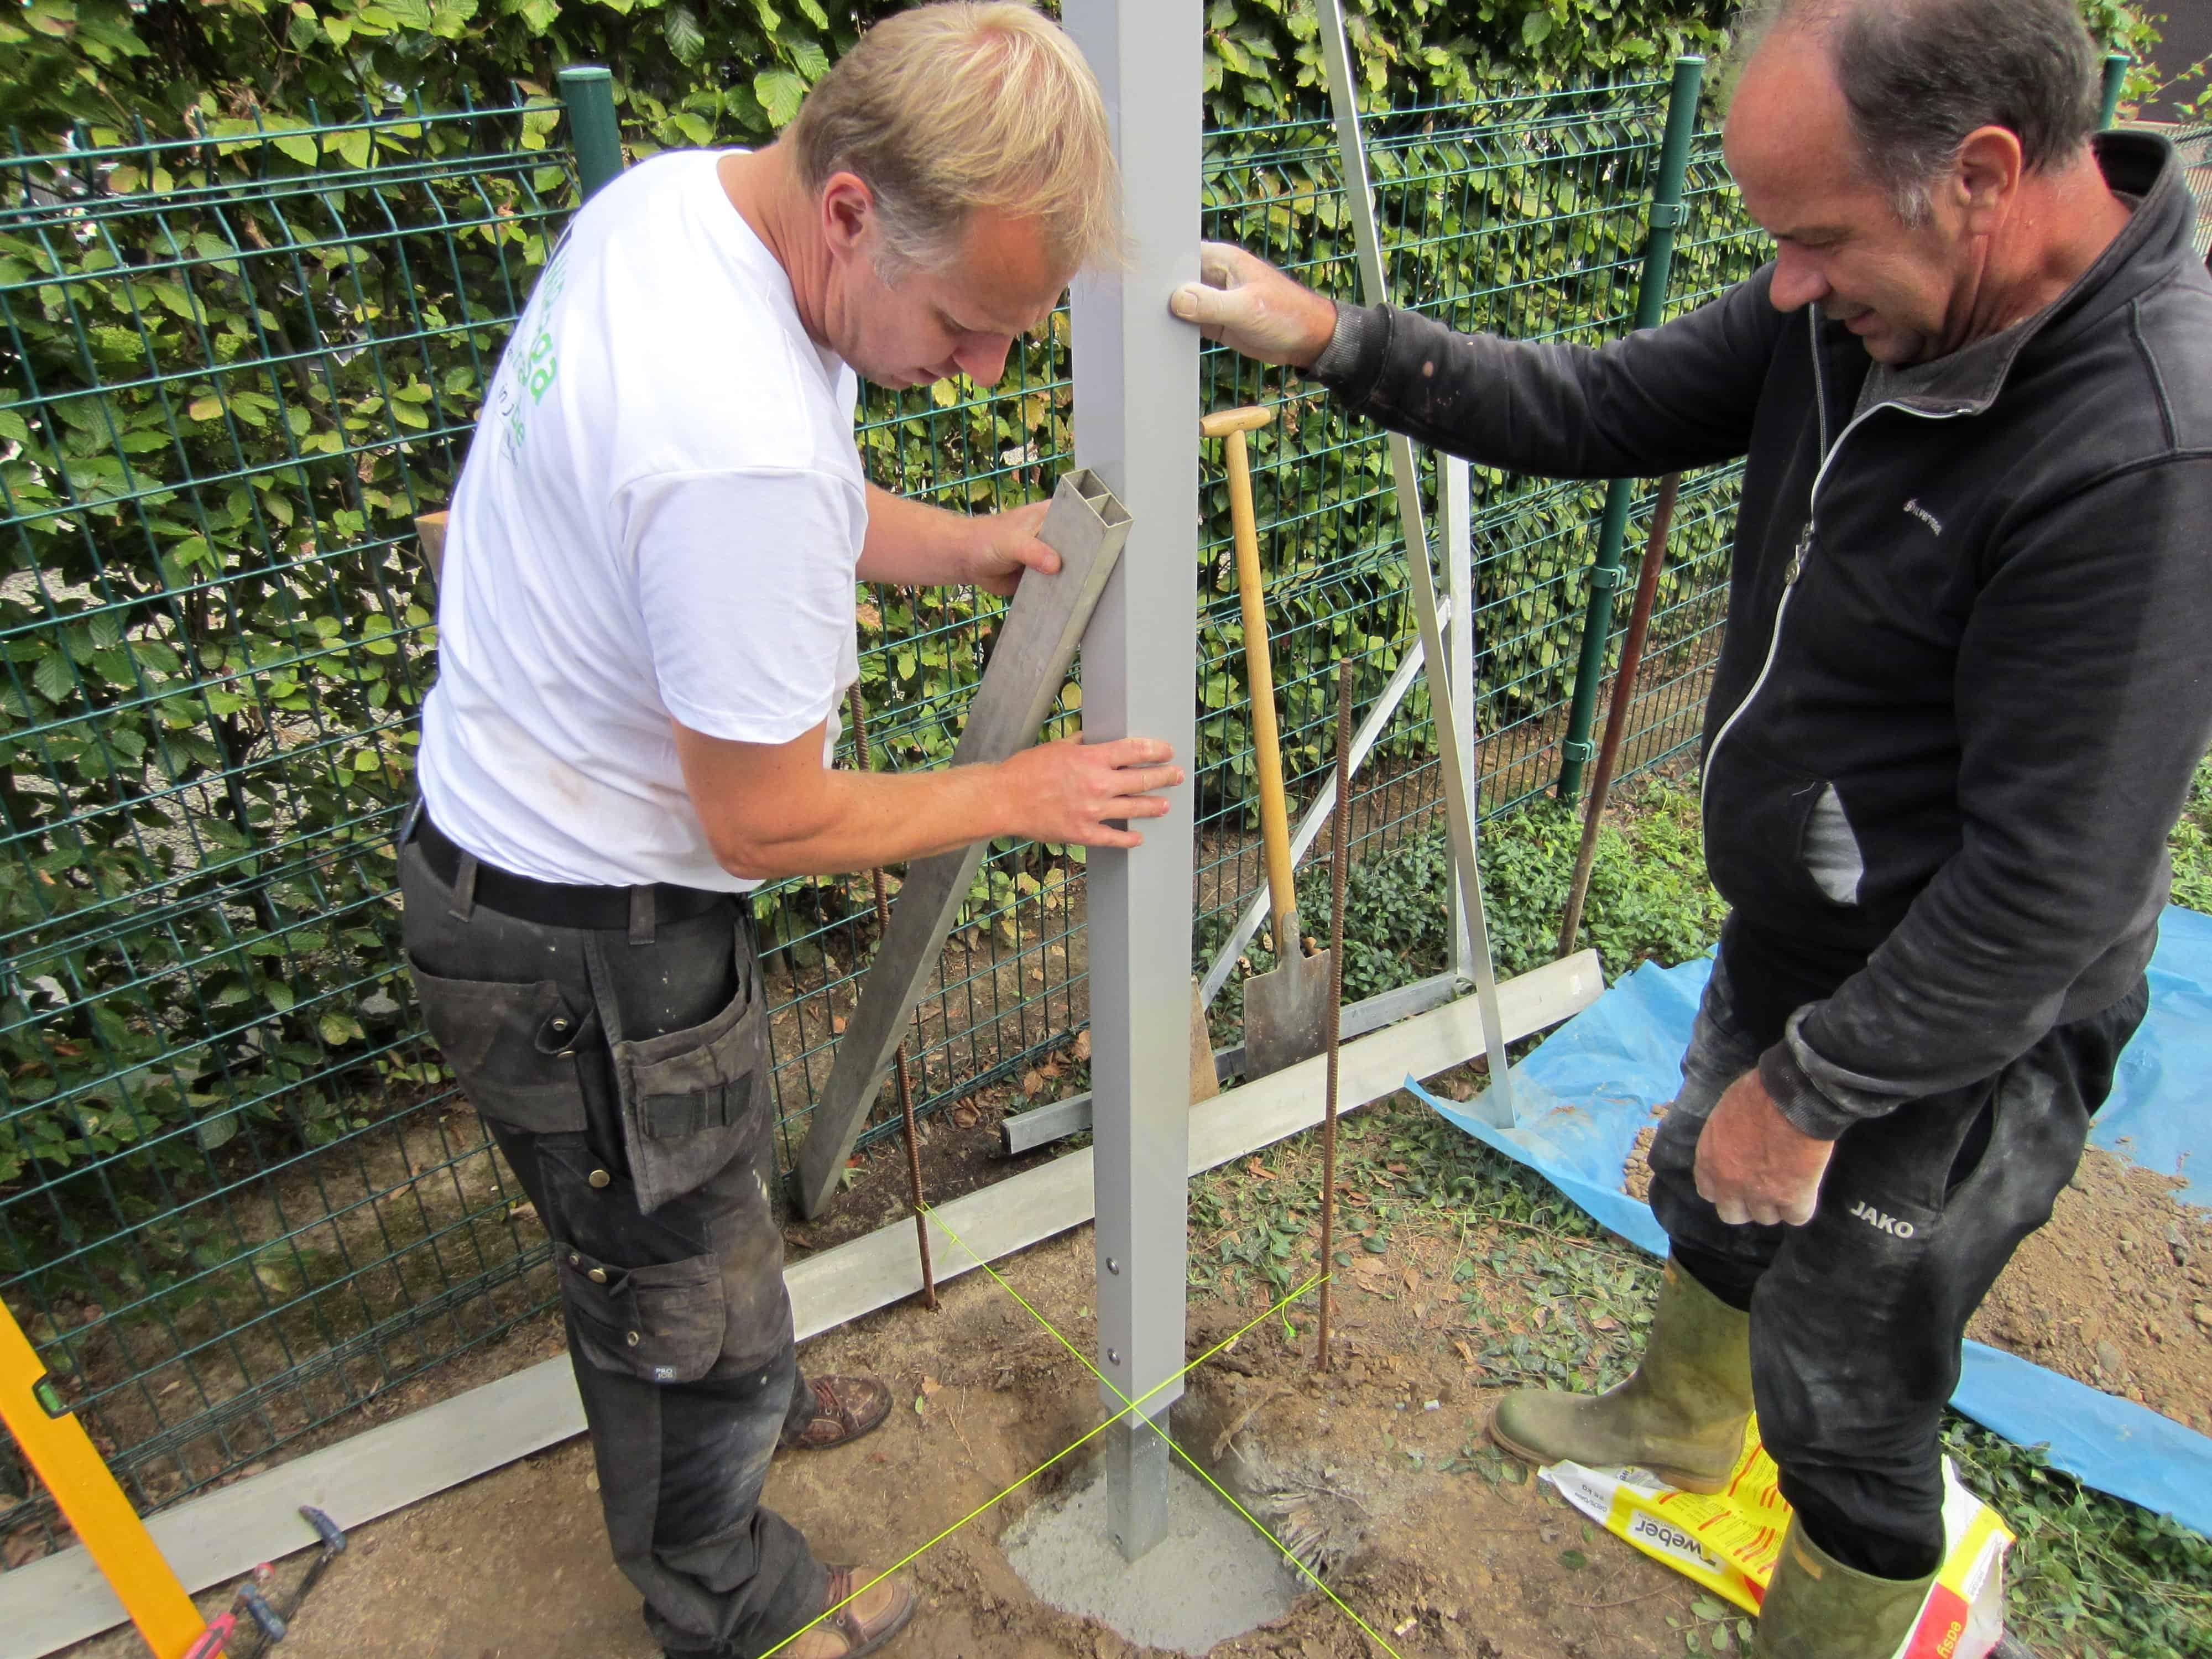 Paal tuinscherm loodrecht vastzetten